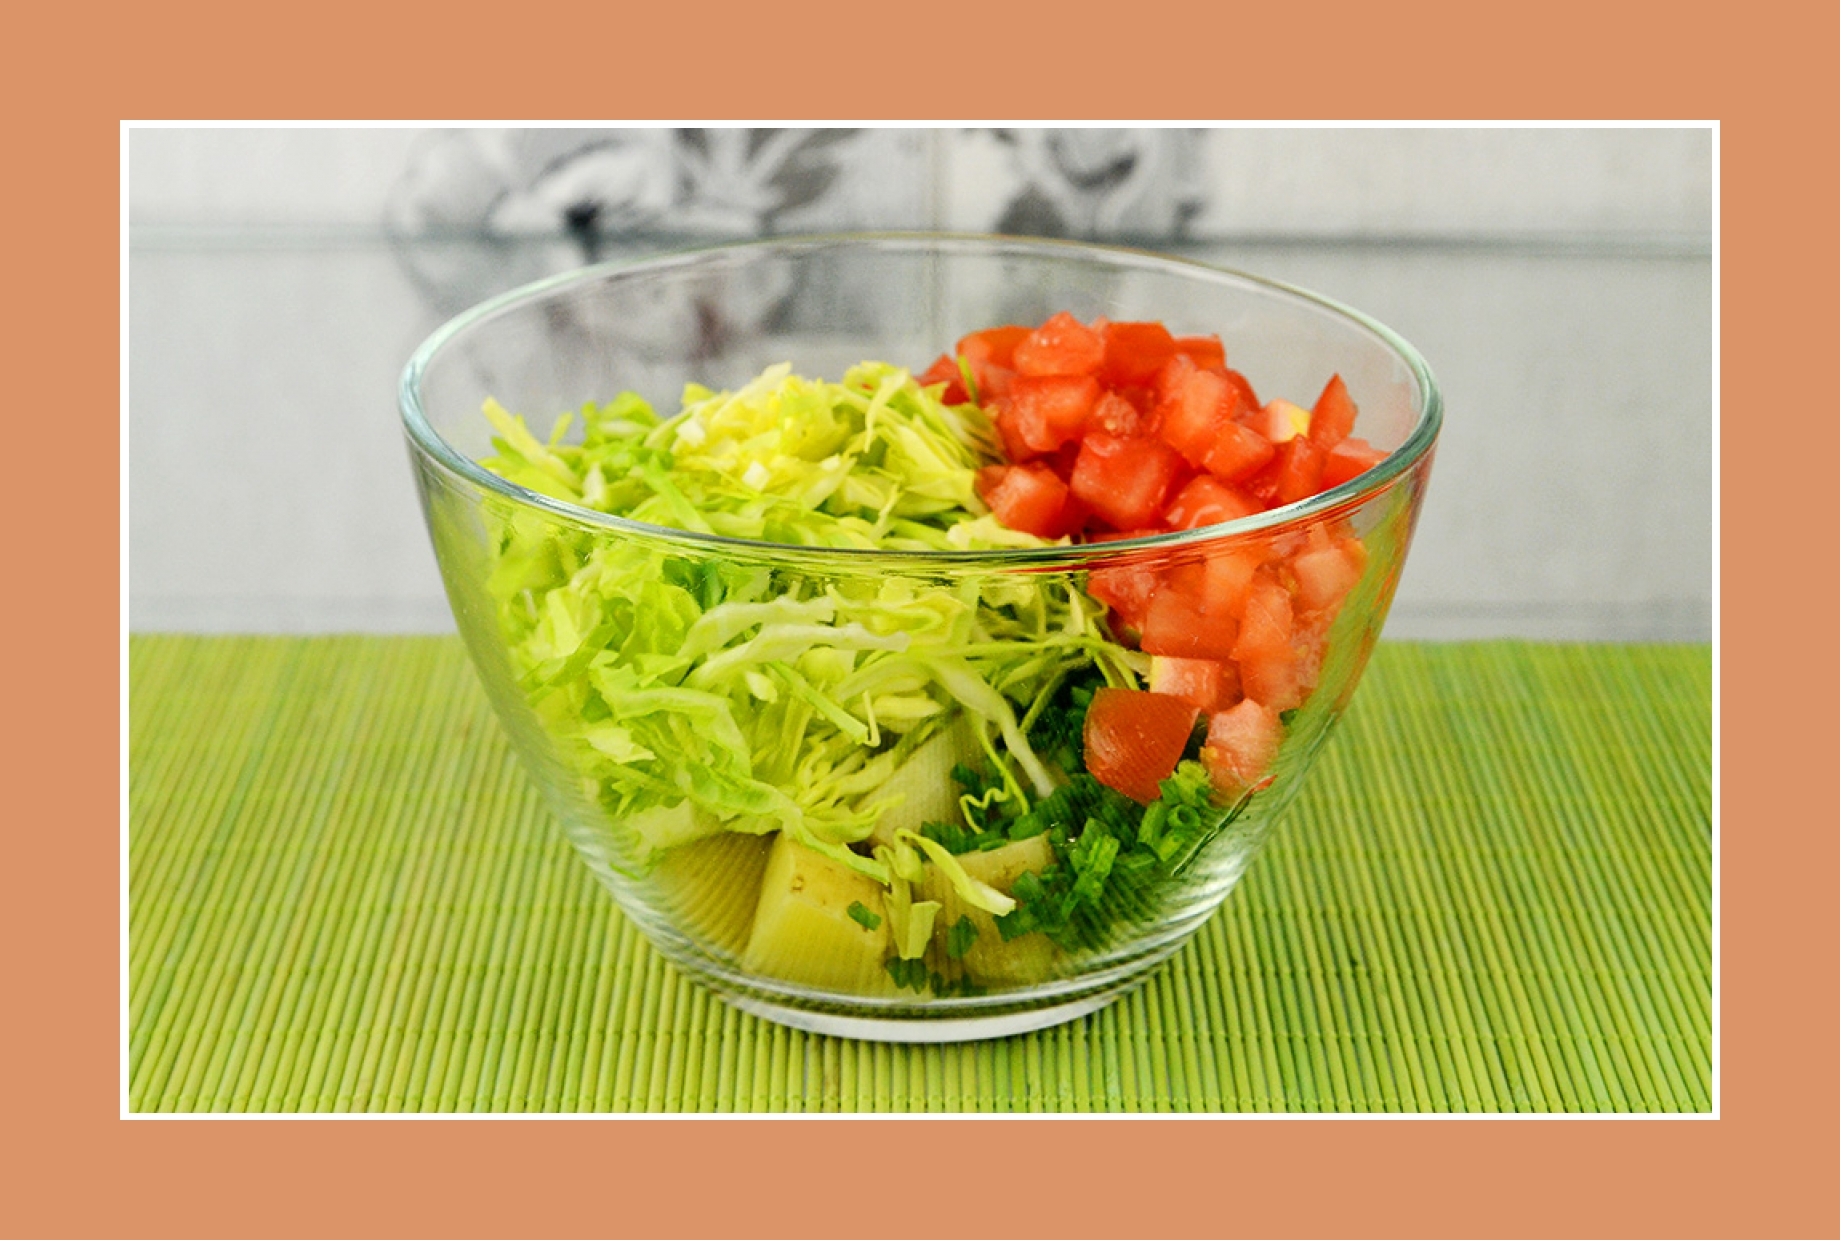 Tomaten für Kartoffelsalat Weißkrautsalat